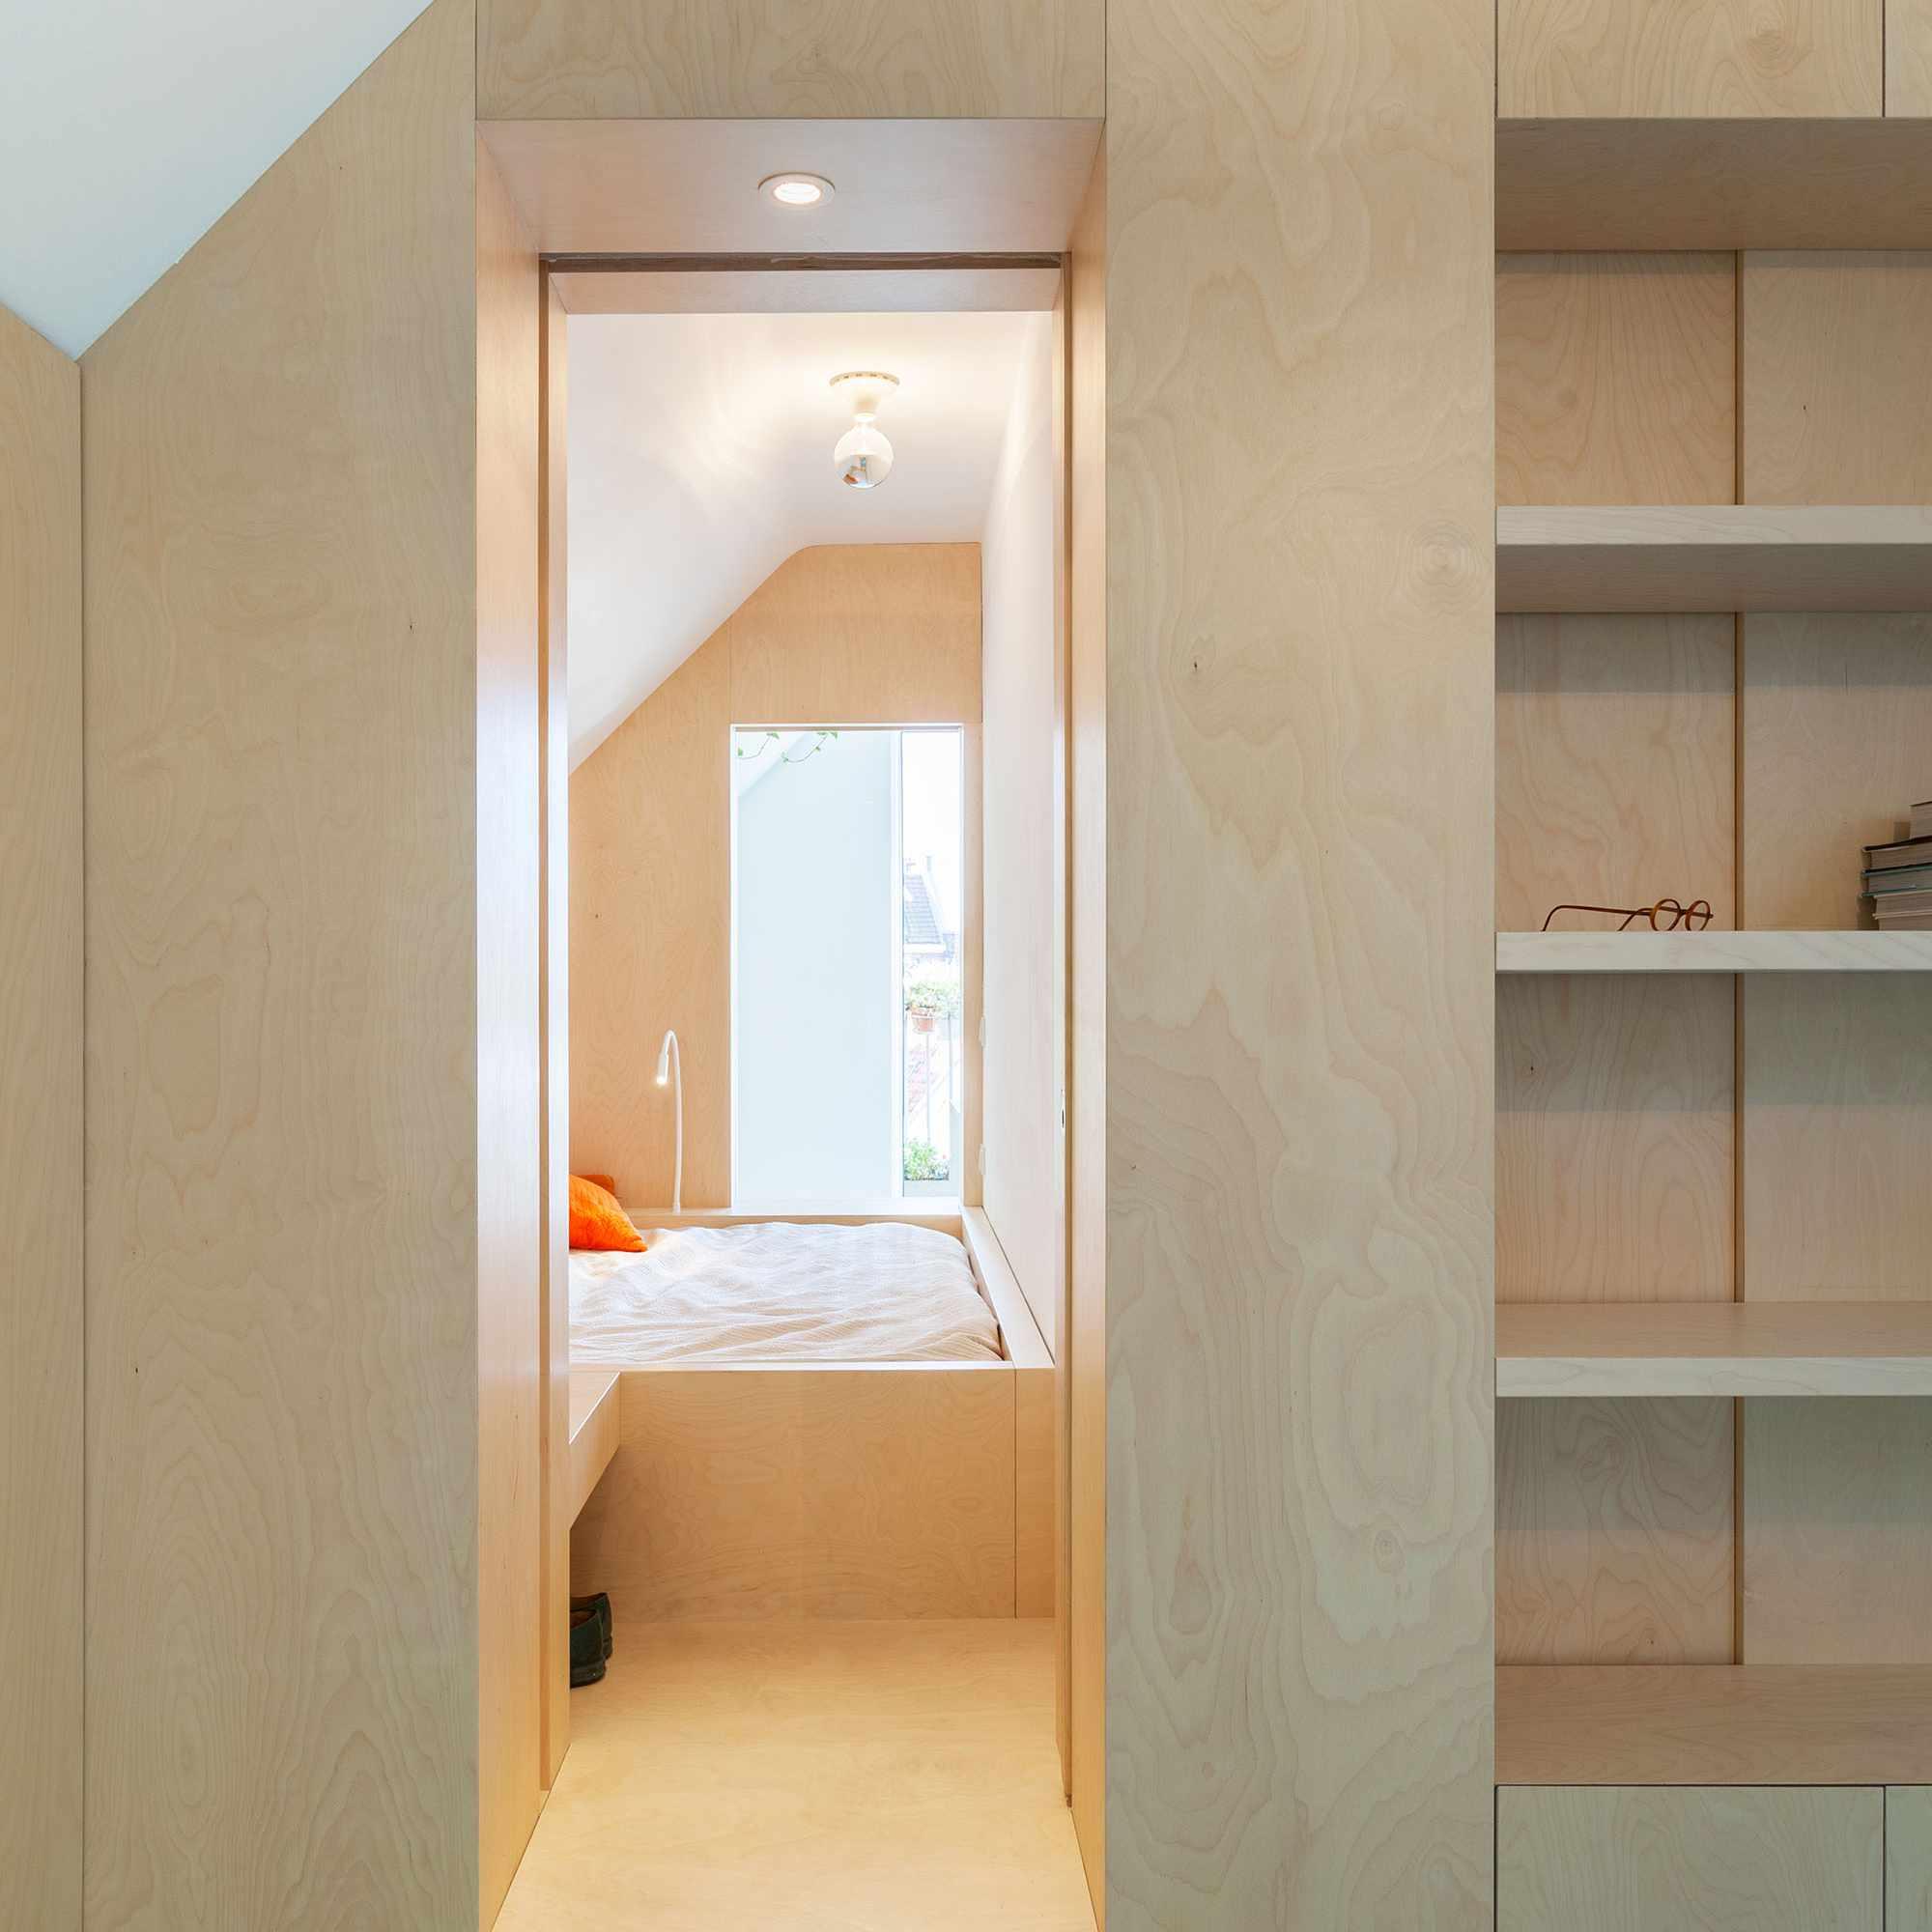 Amsterdam Urban Loft by Bureau Fraai box-bed bedroom